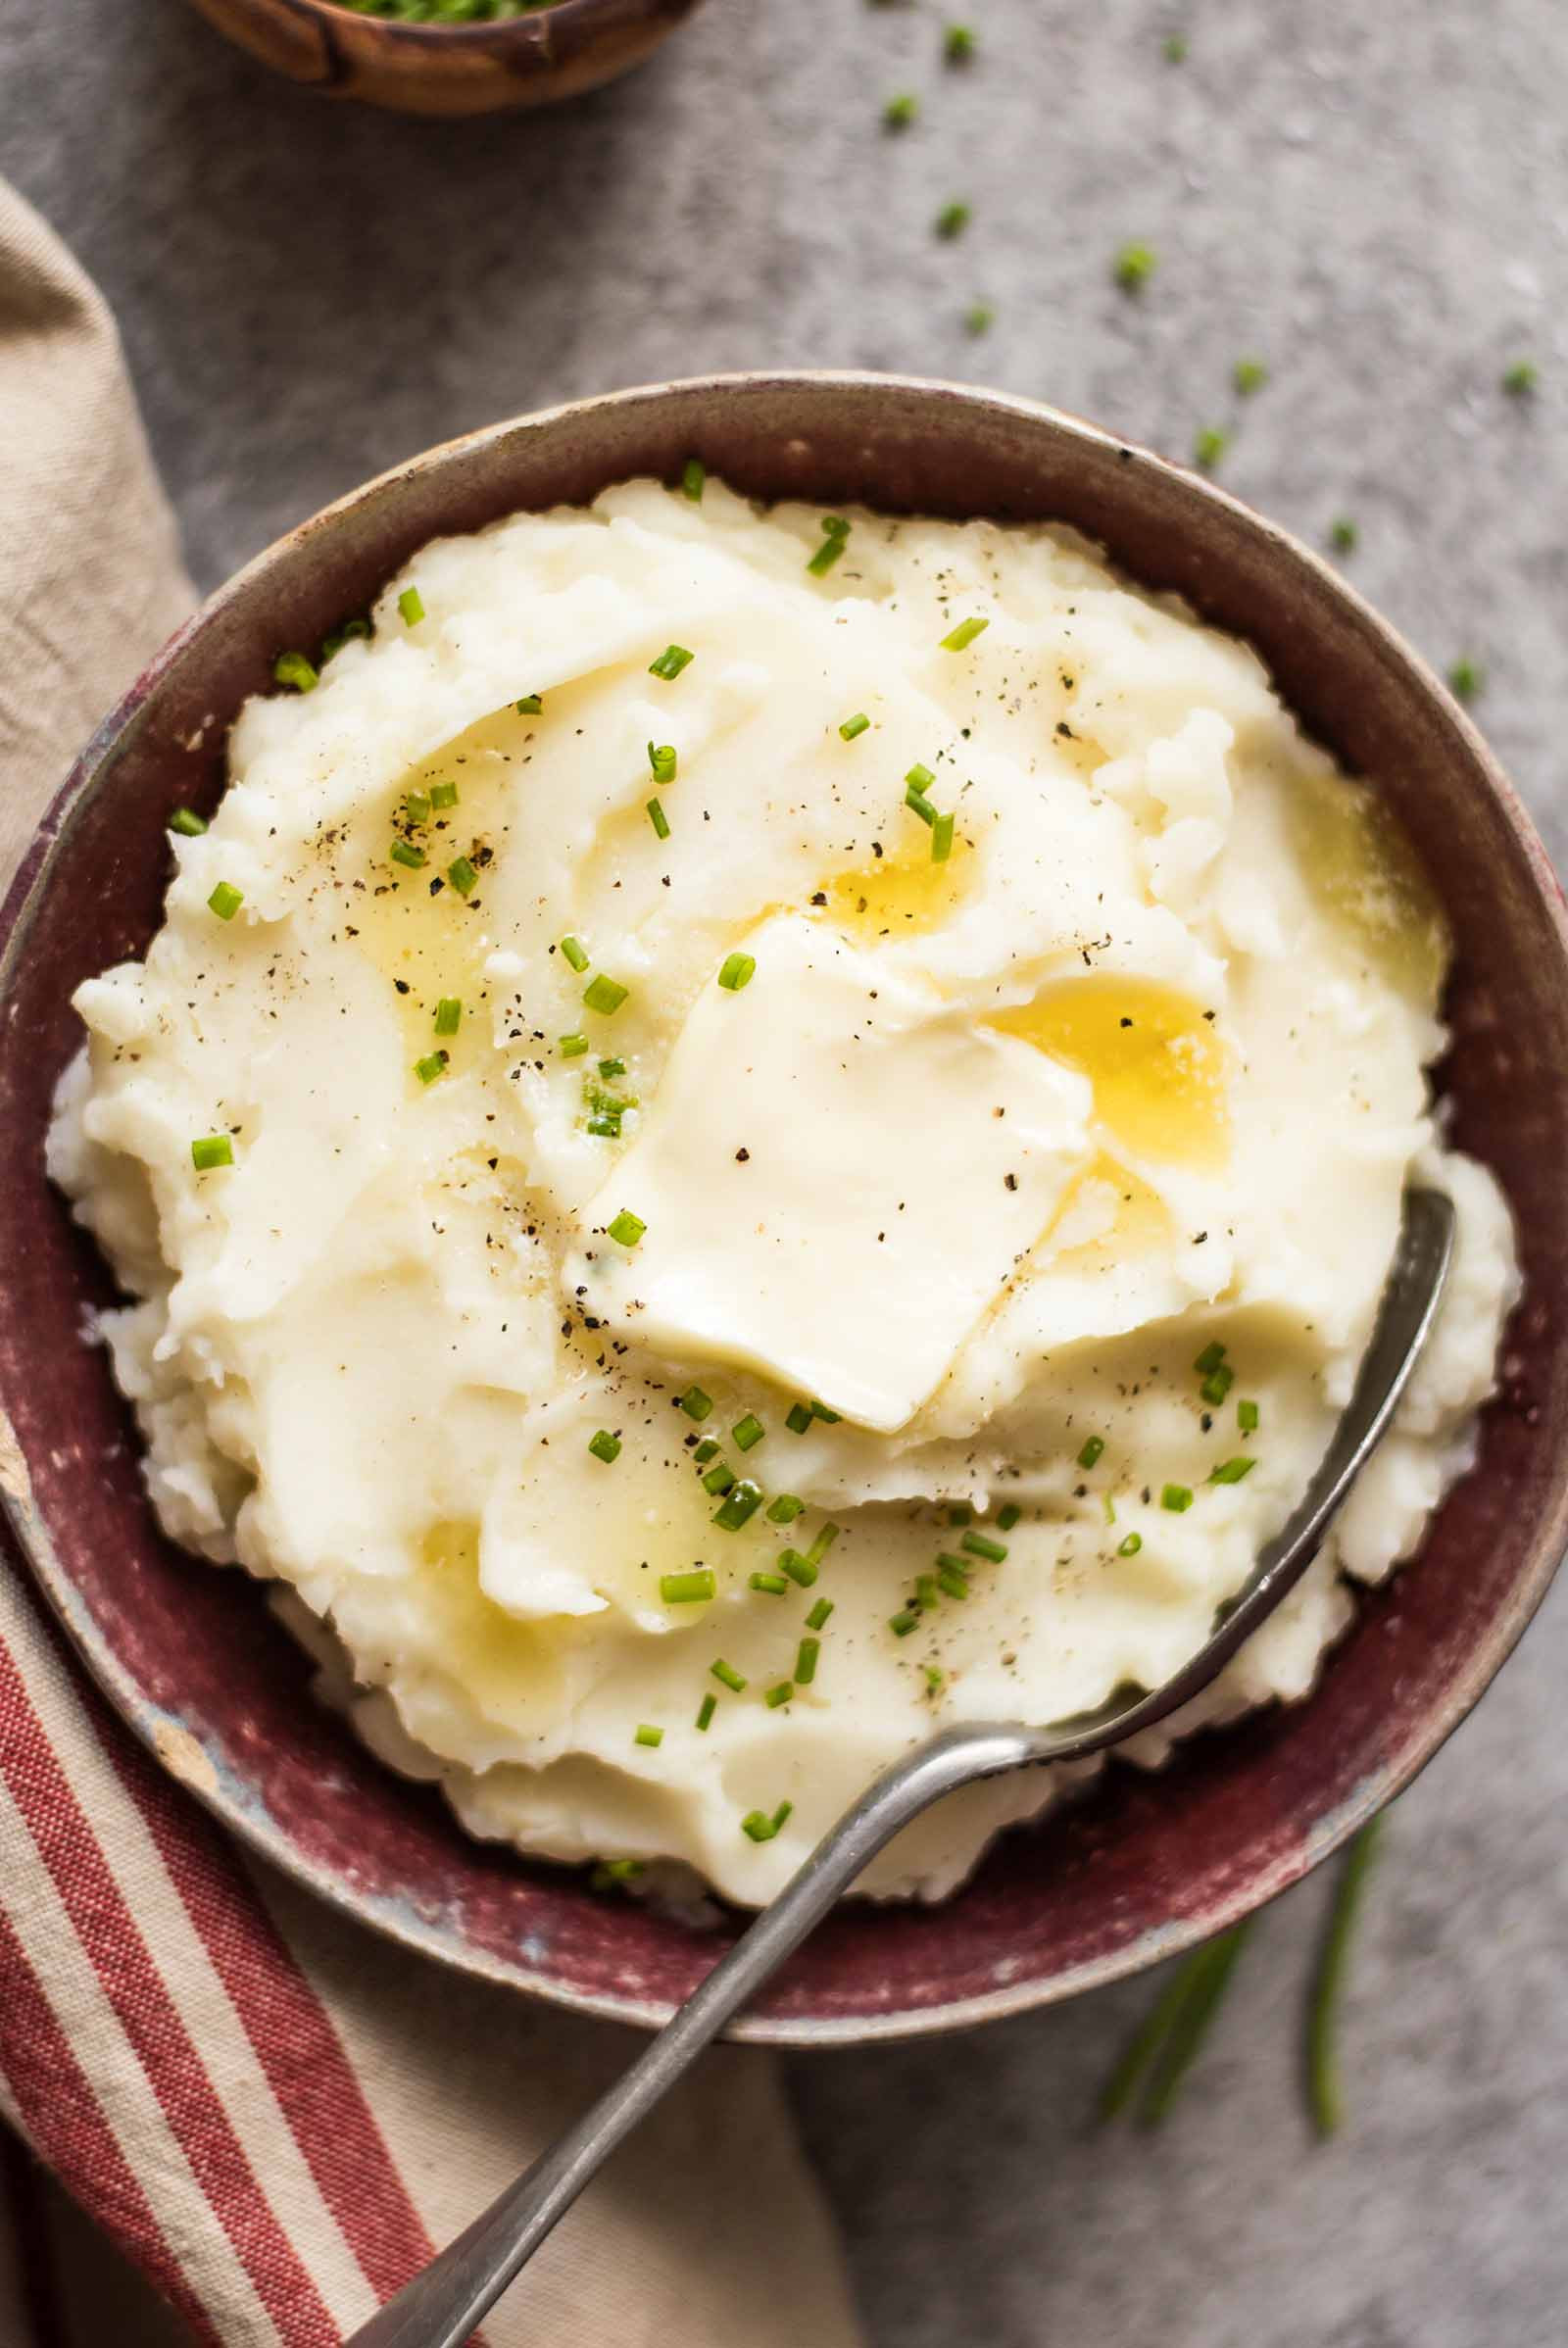 Mashed Potatoes Thanksgiving  Crock Pot Mashed Potatoes Easy & No Stress